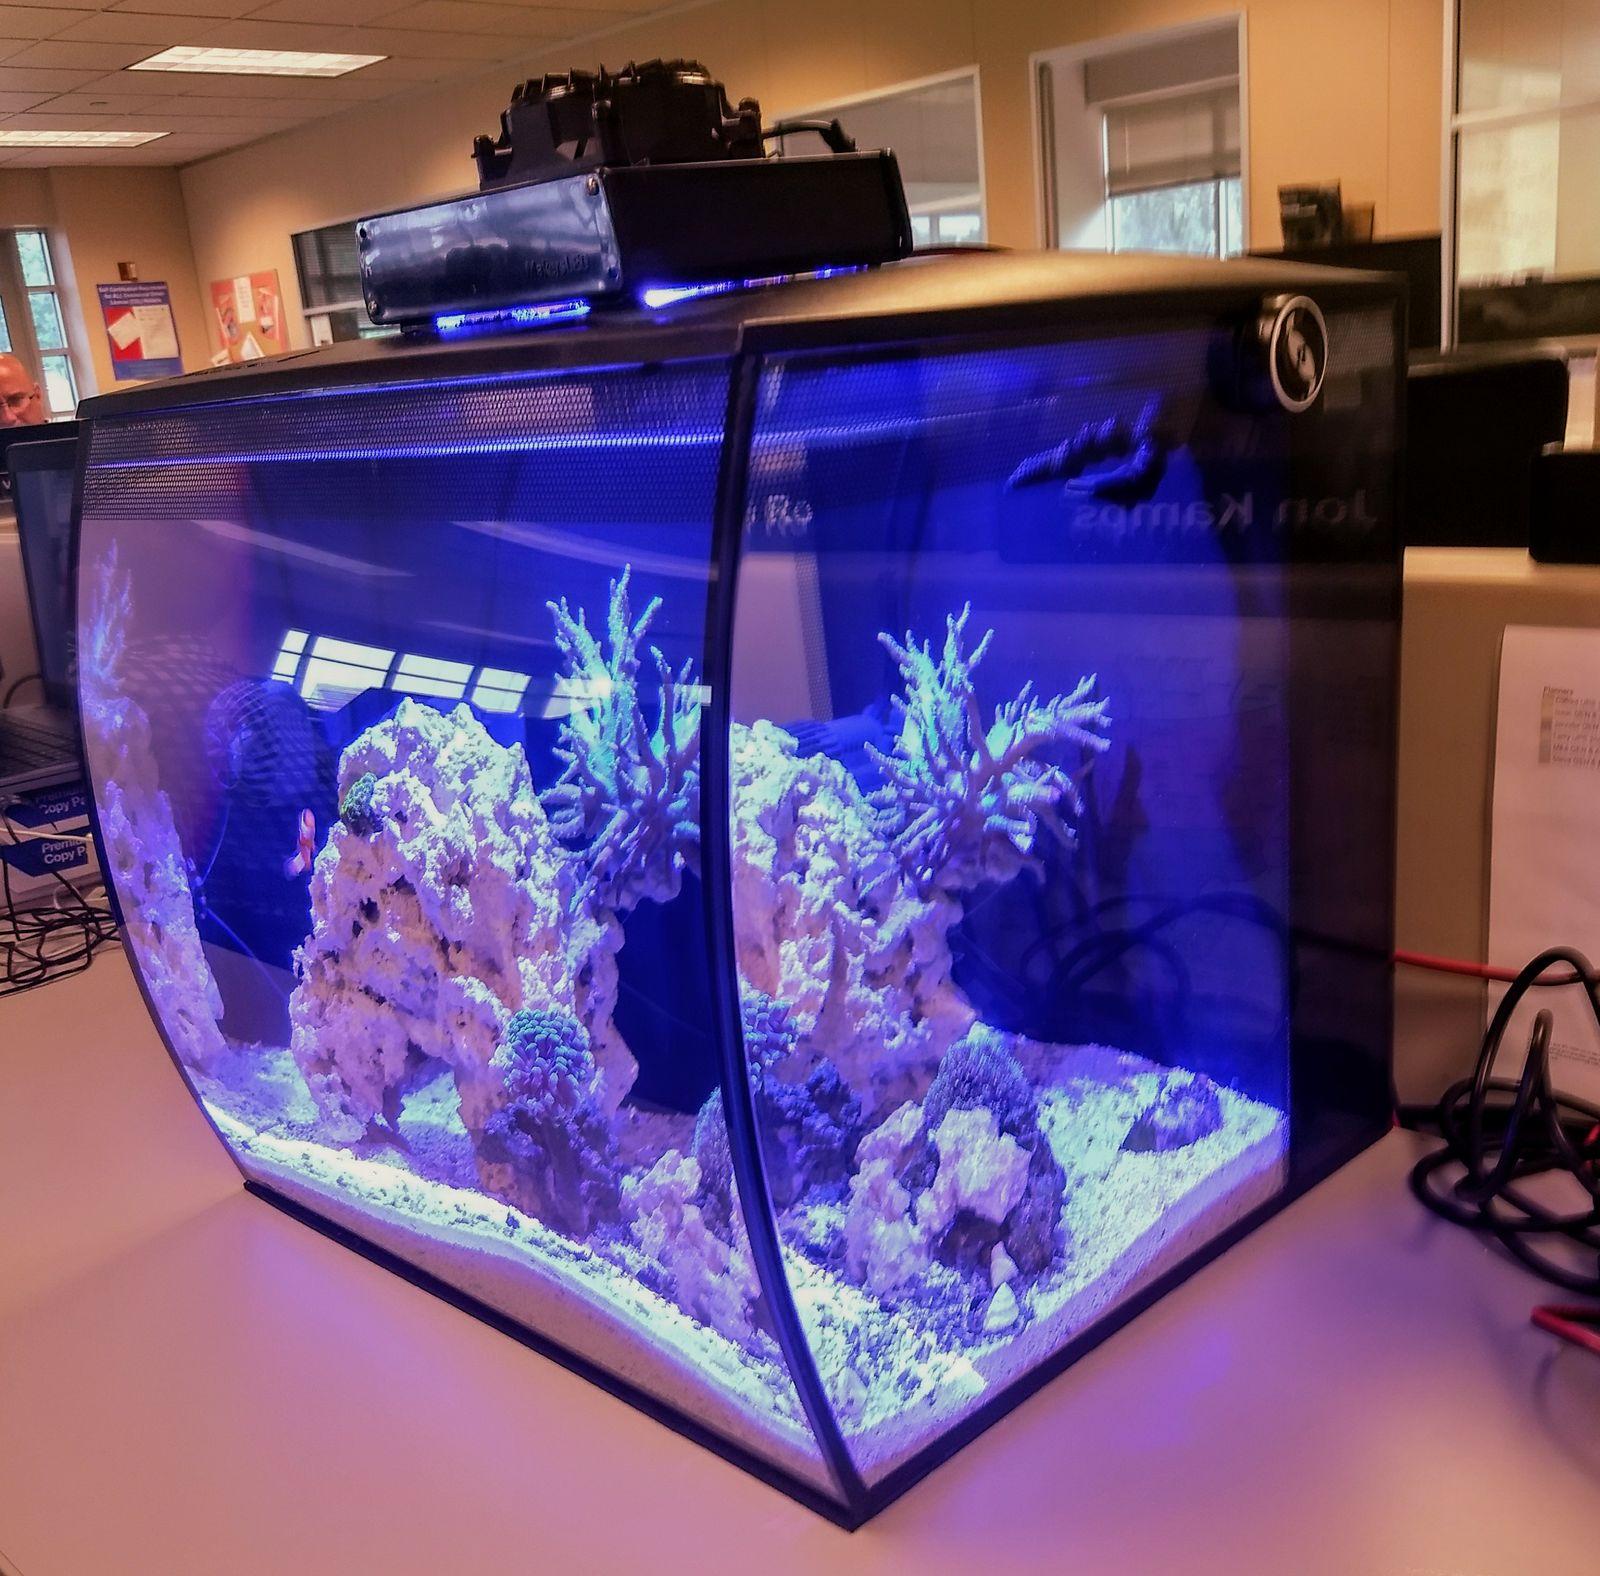 Fluval Flex 15 reef conversion - DIY Projects - Nano-Reef com Community